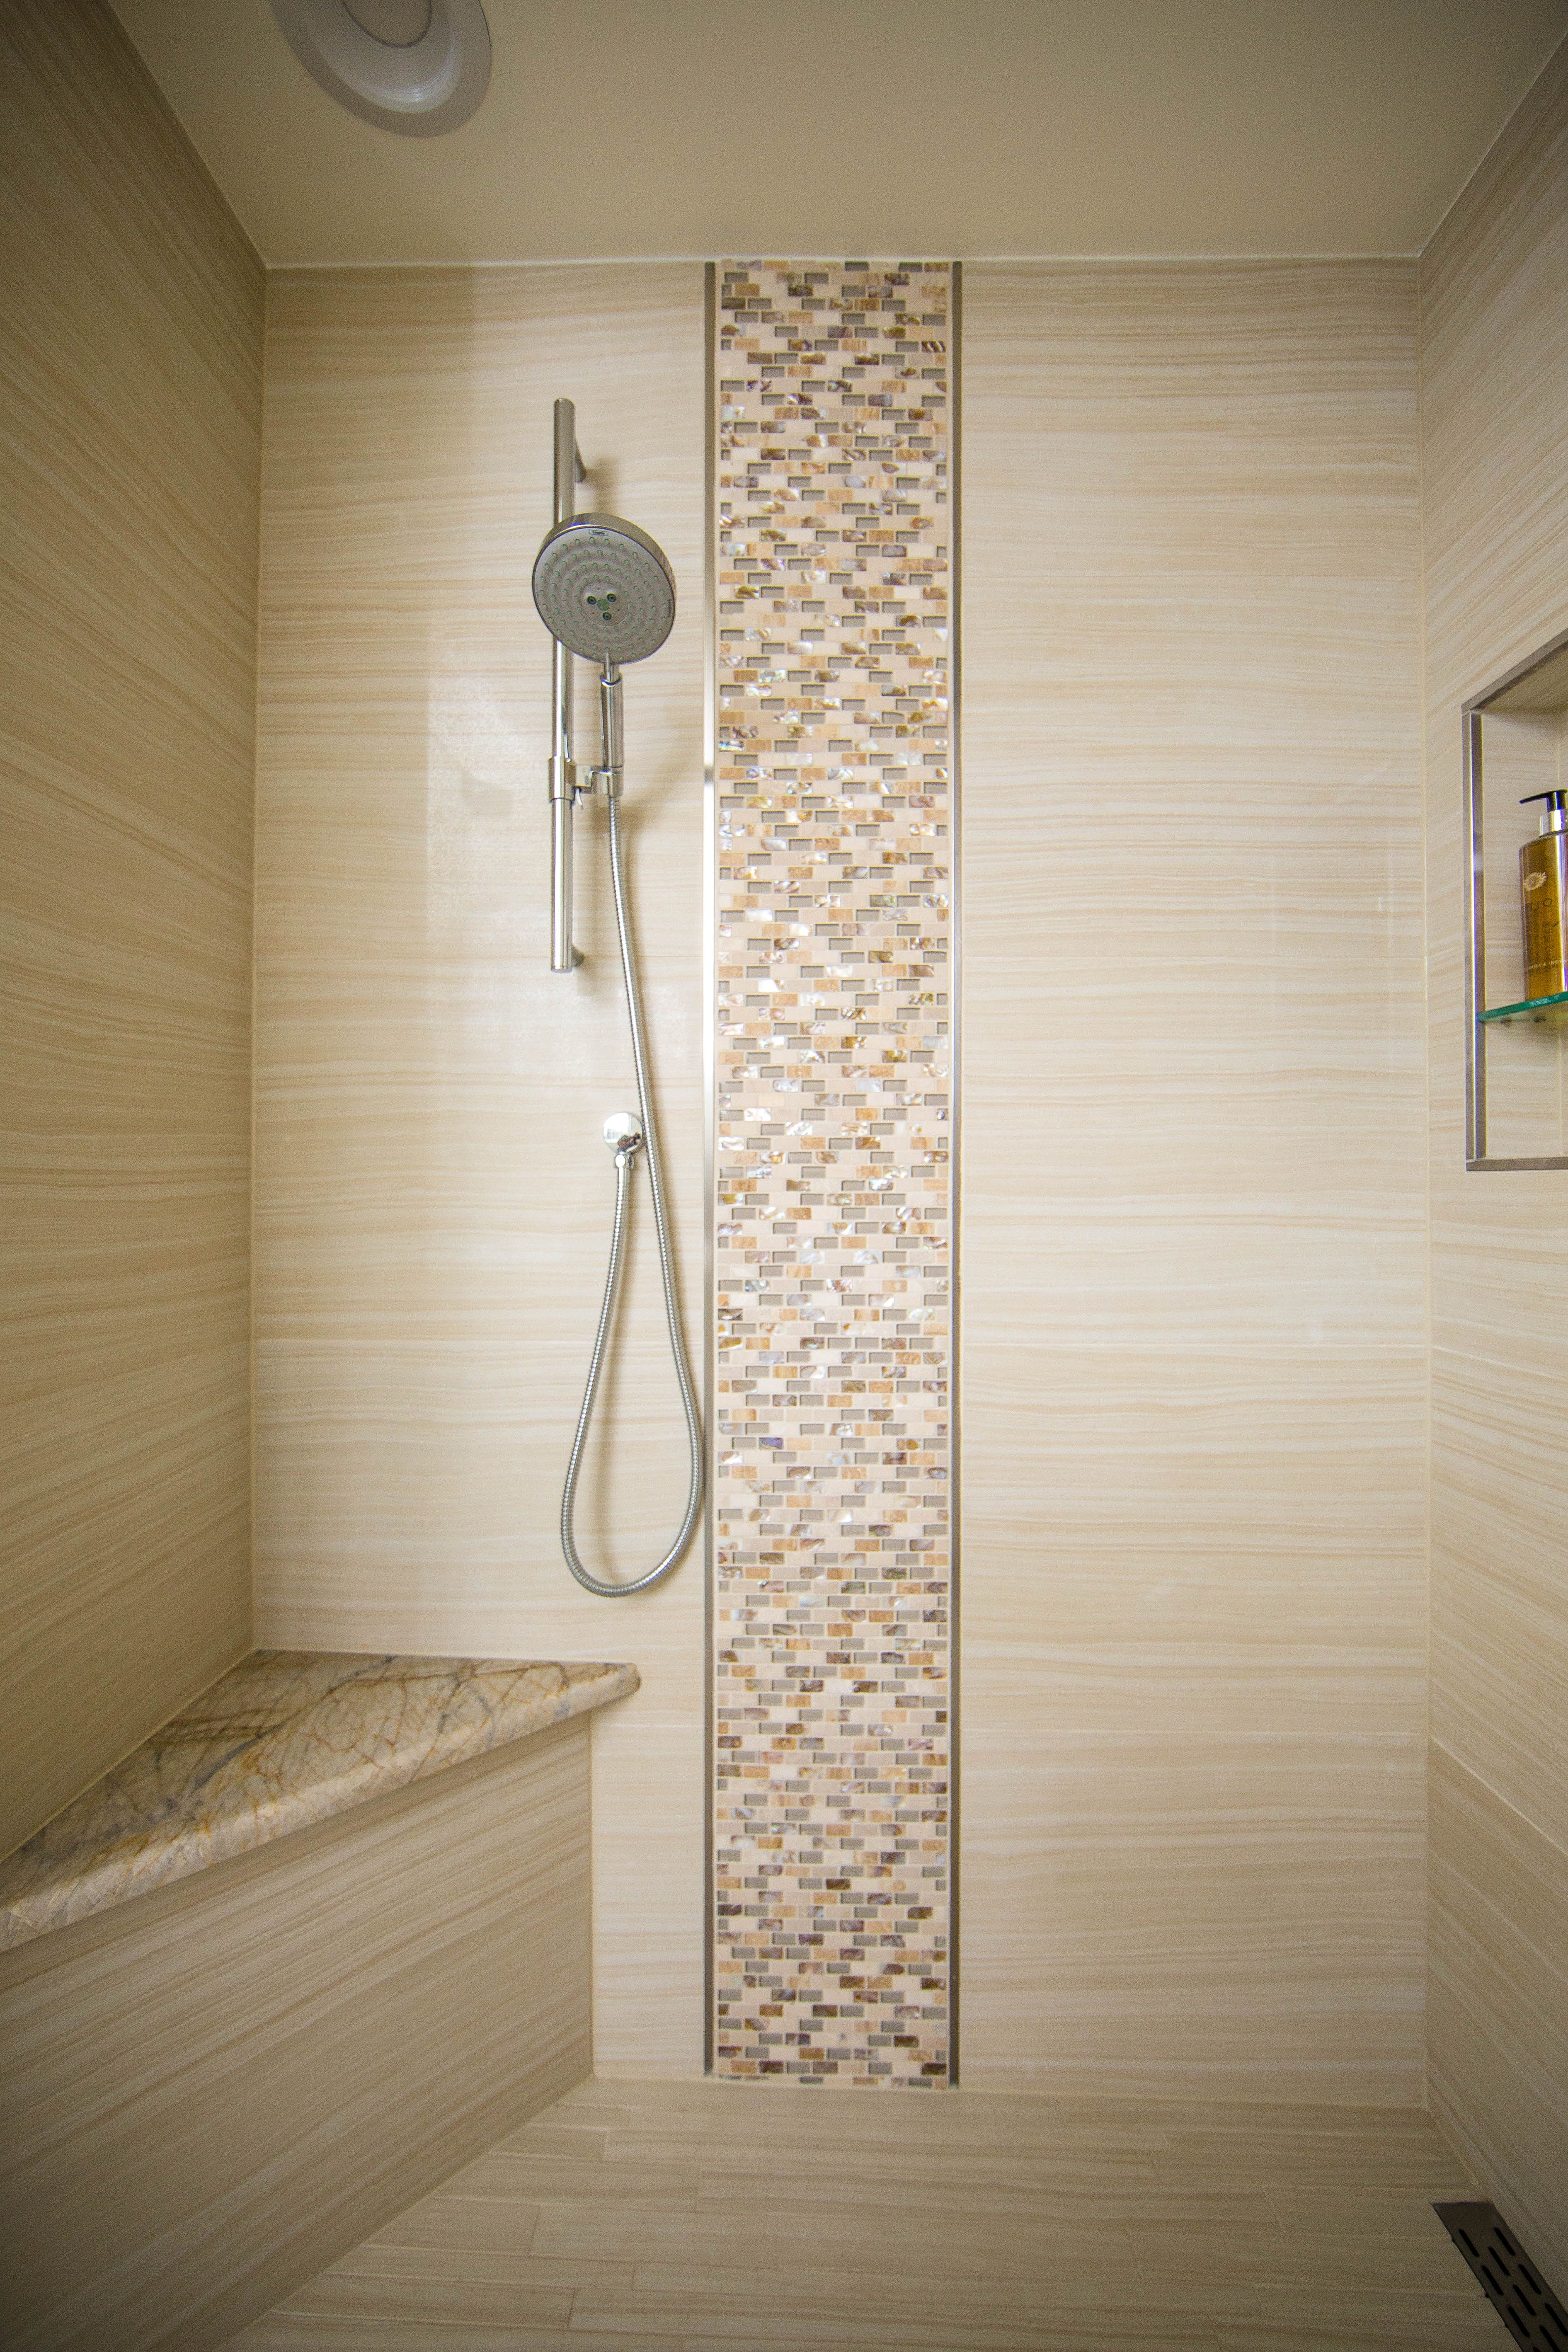 bathroom glass tile mosaics marble tile northern virginia conestoga tile bathroom tile designs glass tile bathroom glass bathroom